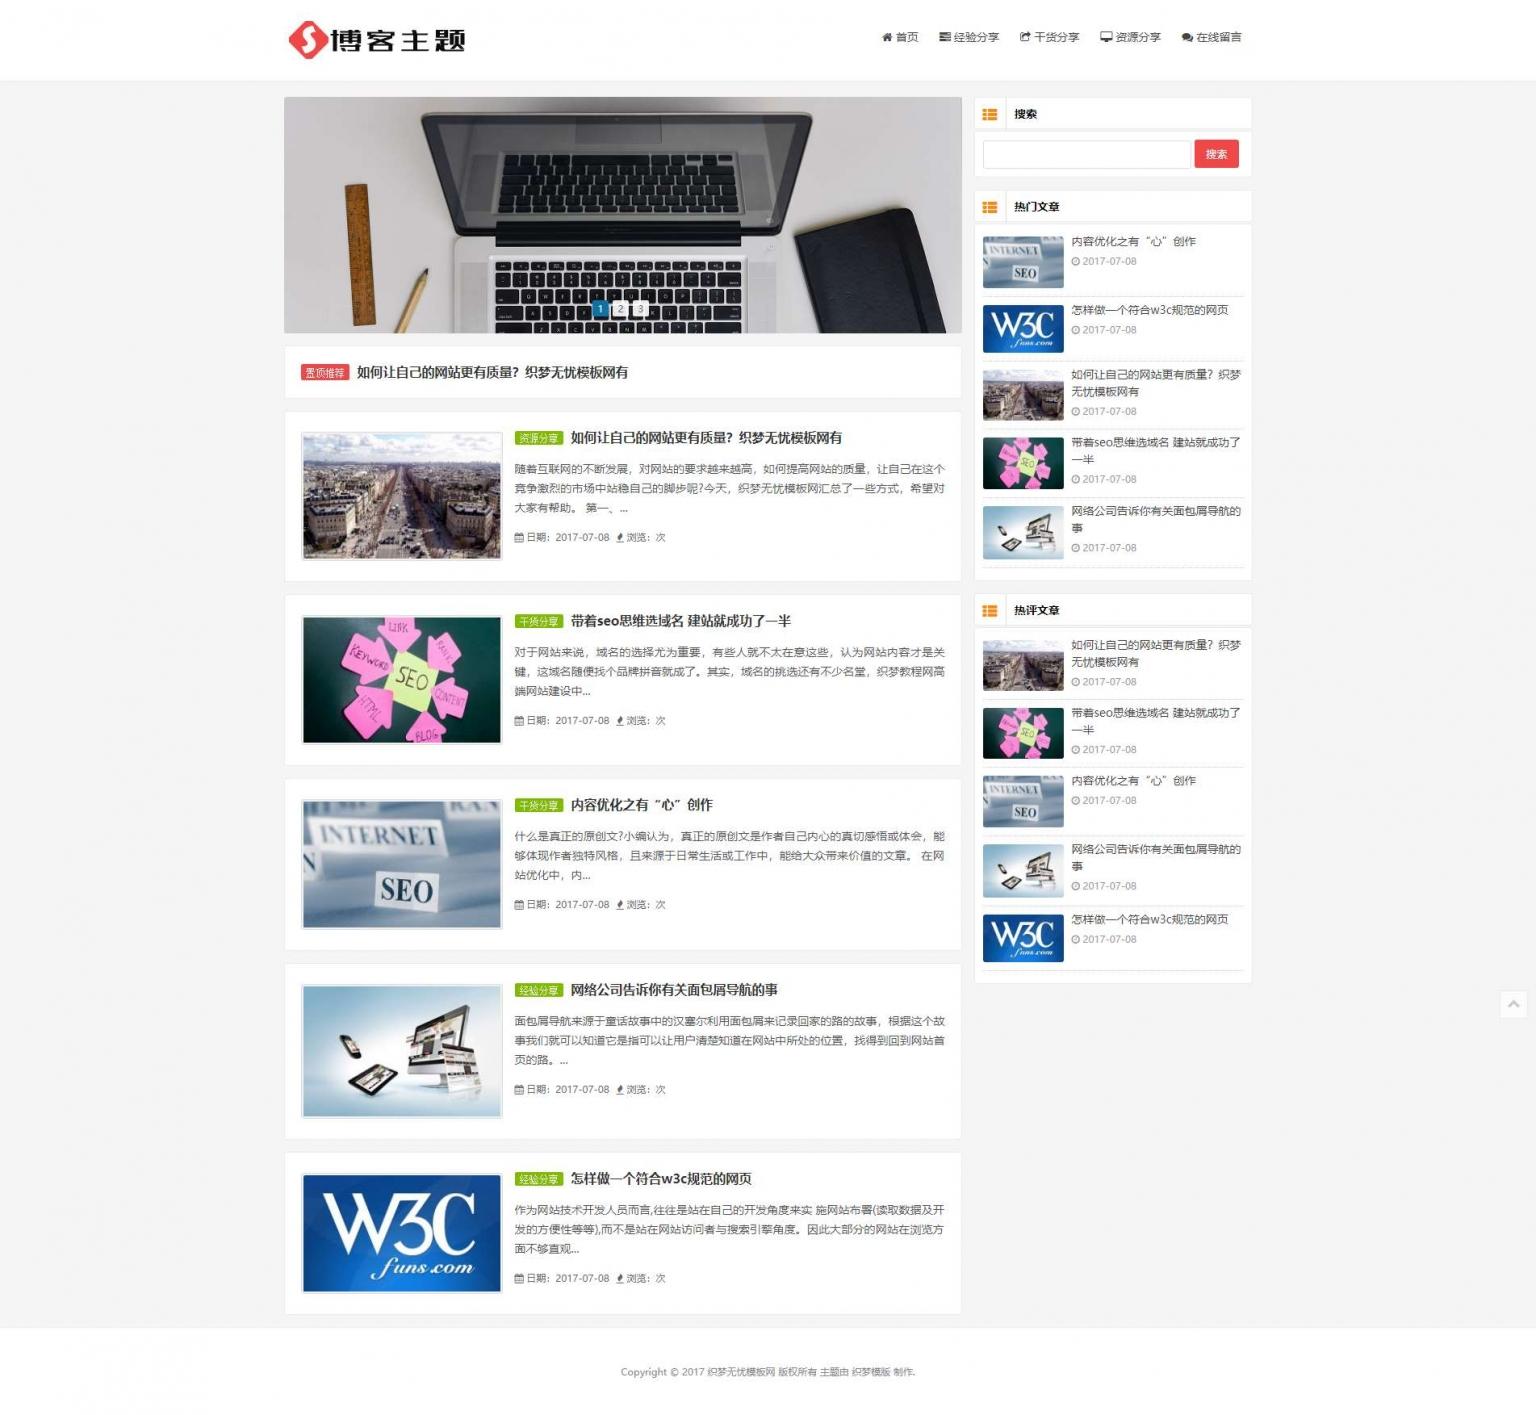 H5响应式资讯新闻清新自然主题风格个人网站织梦模板源码[带移动端]插图